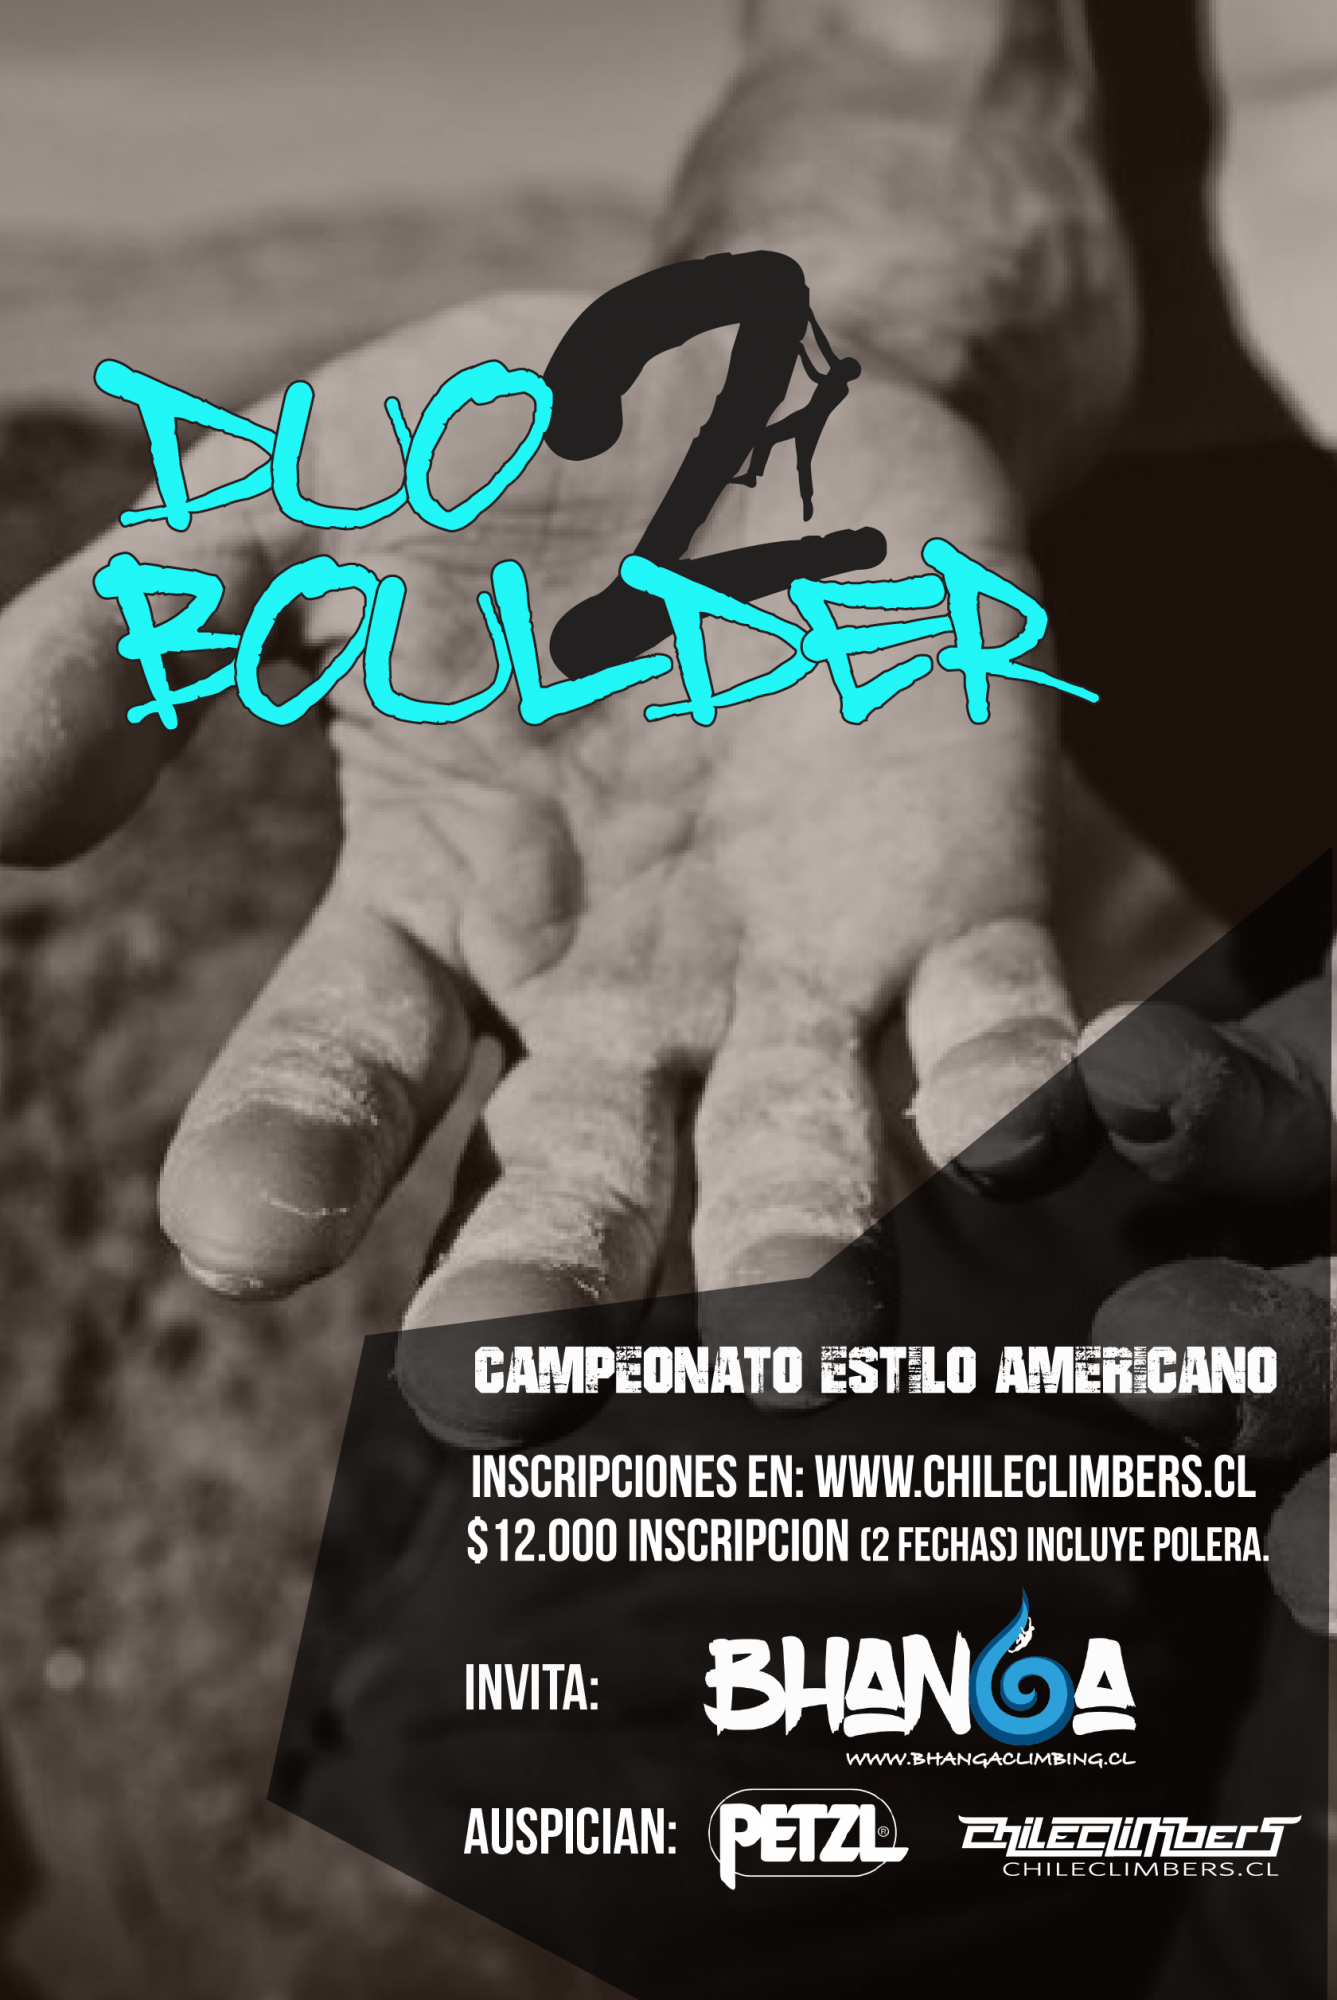 afiche duo boulder_vf_ventaonline-01